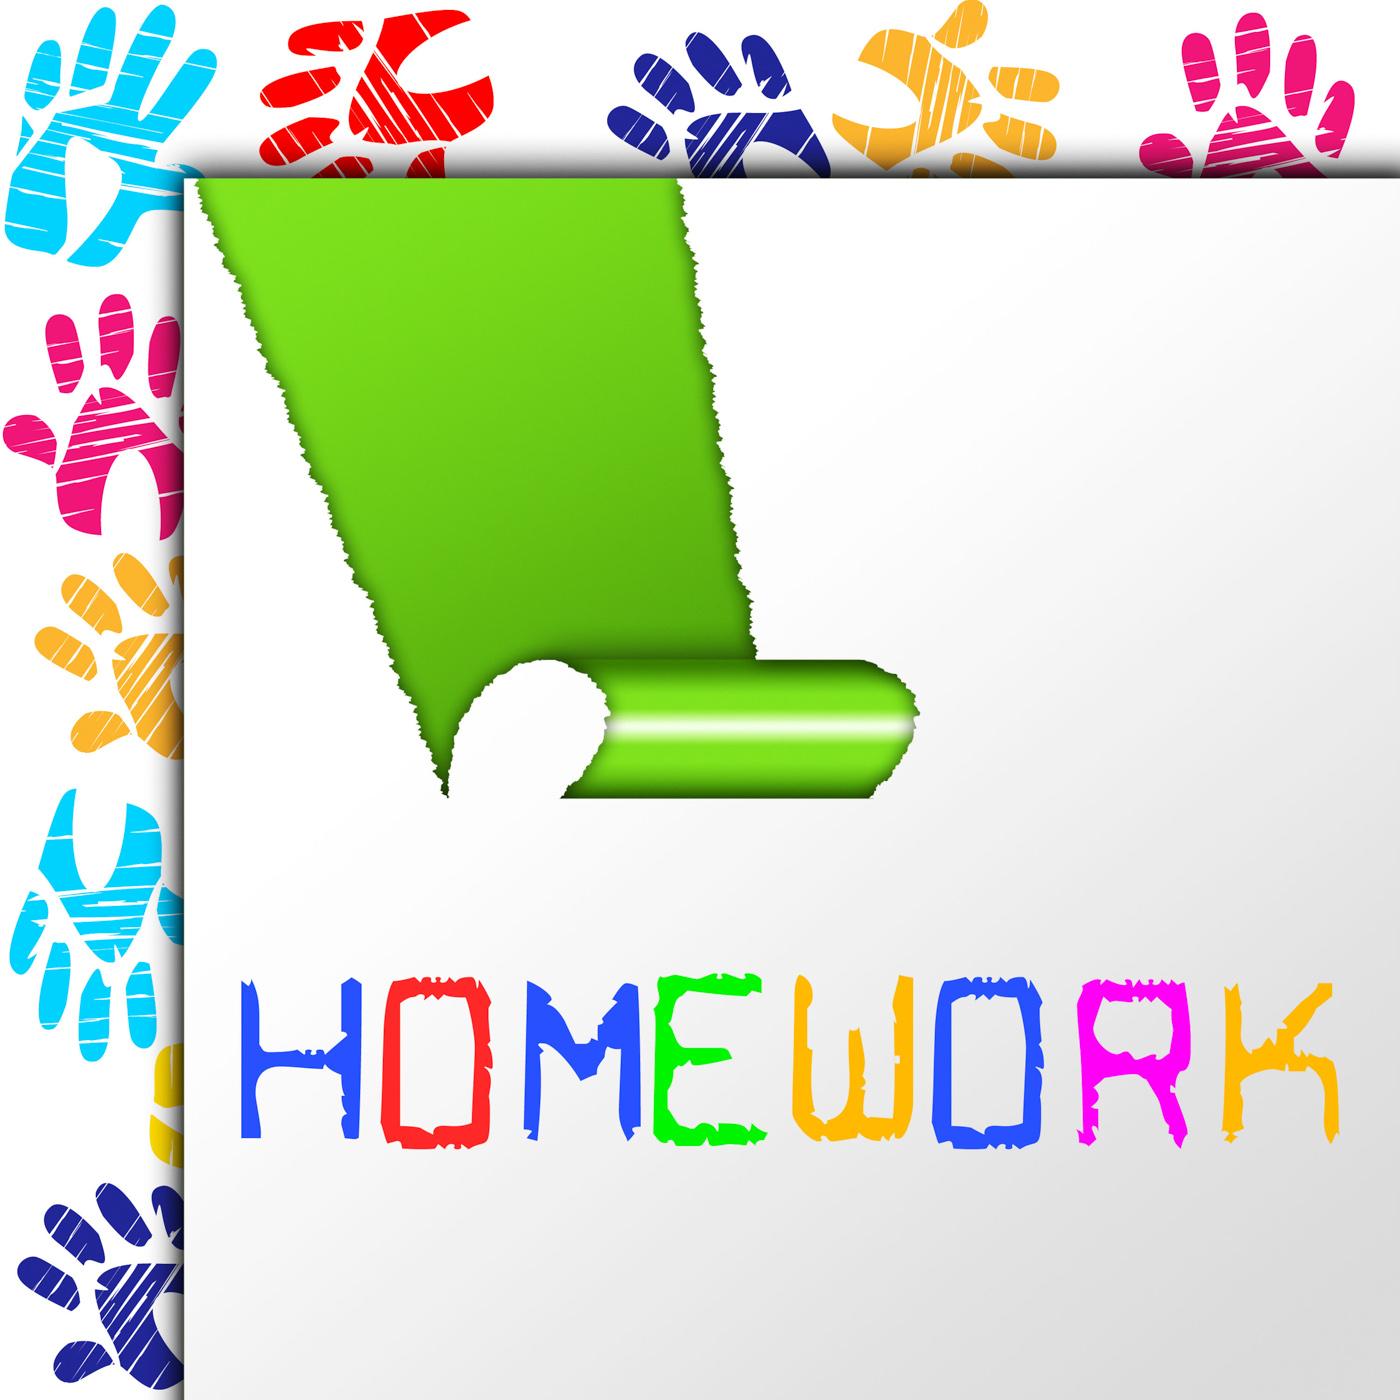 School homework shows university training and learn photo